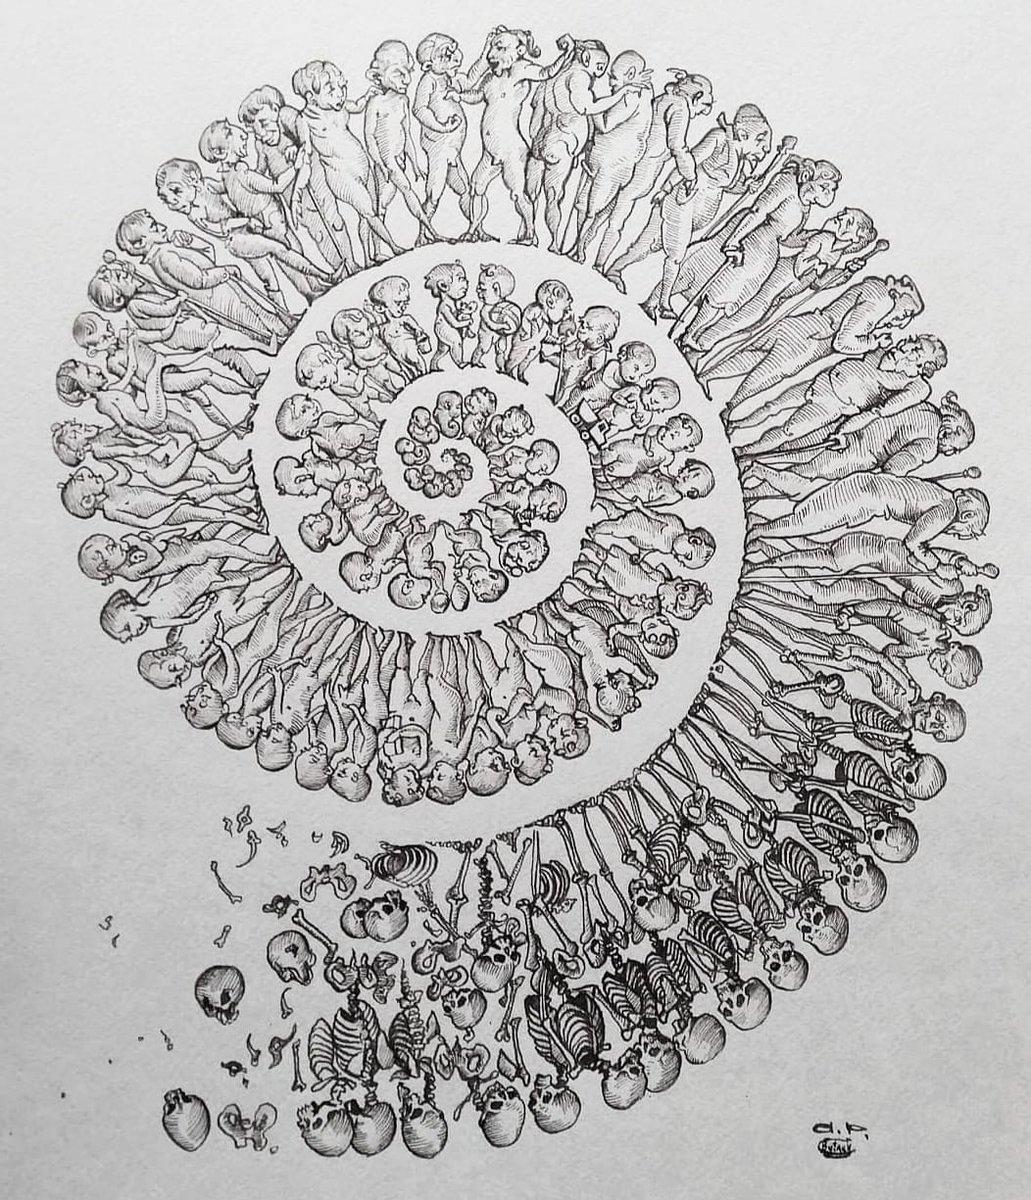 Alexander Butaev - Spiral of Life